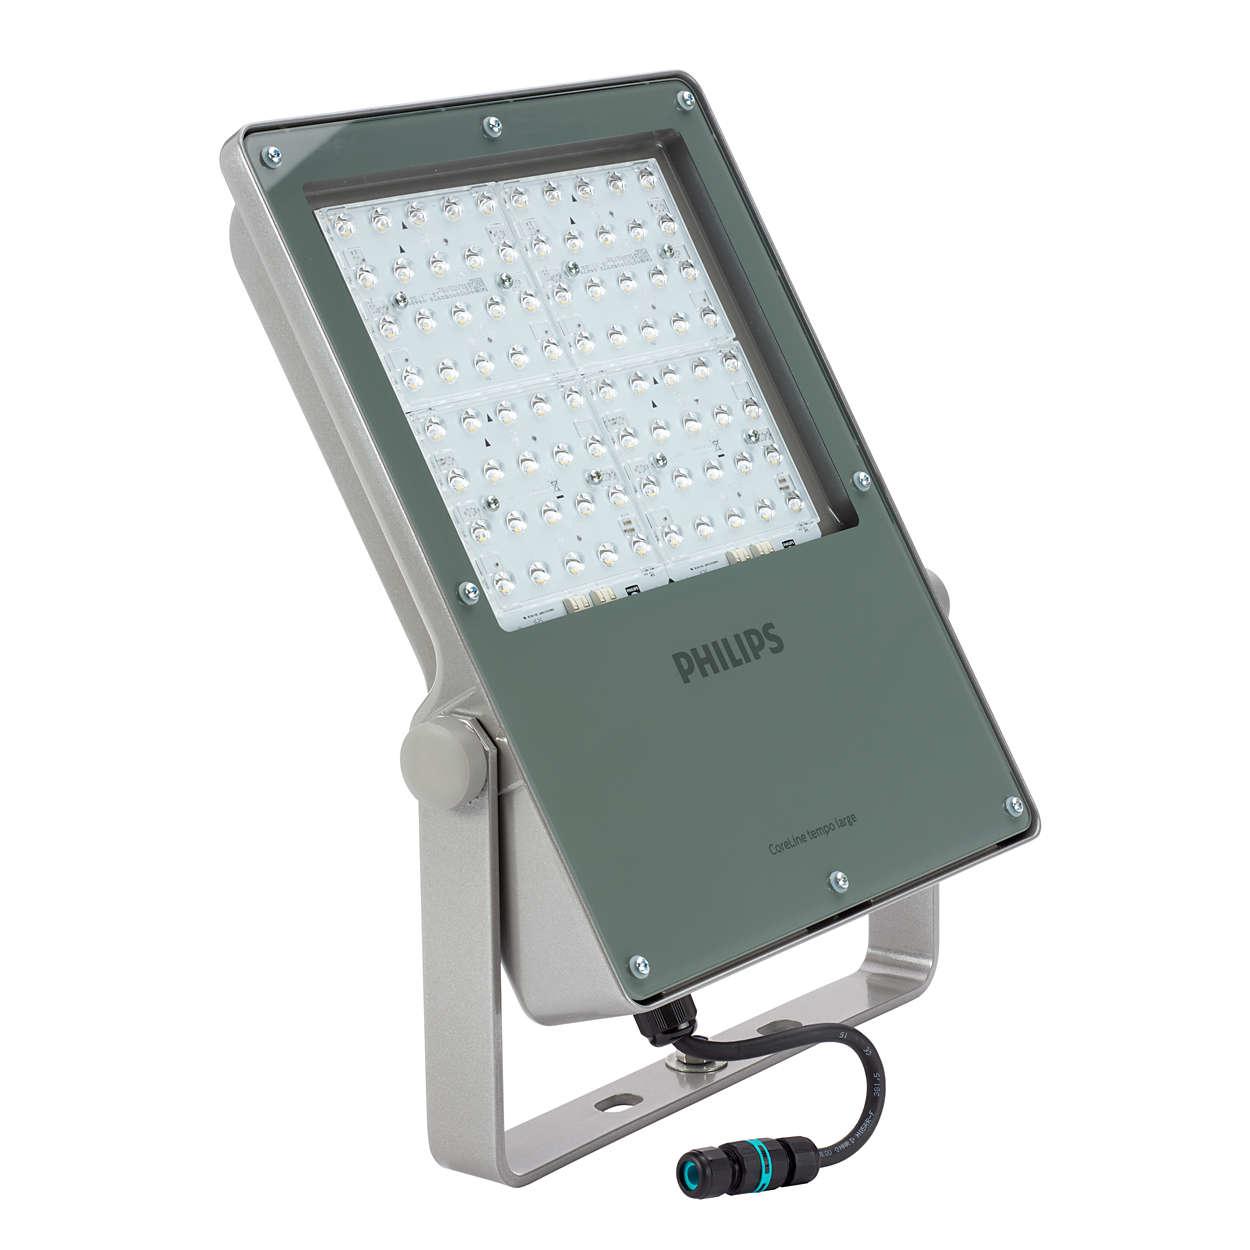 Philips Proiettore LED - BVP130 Tempo Large Asimmetrico - 09641000